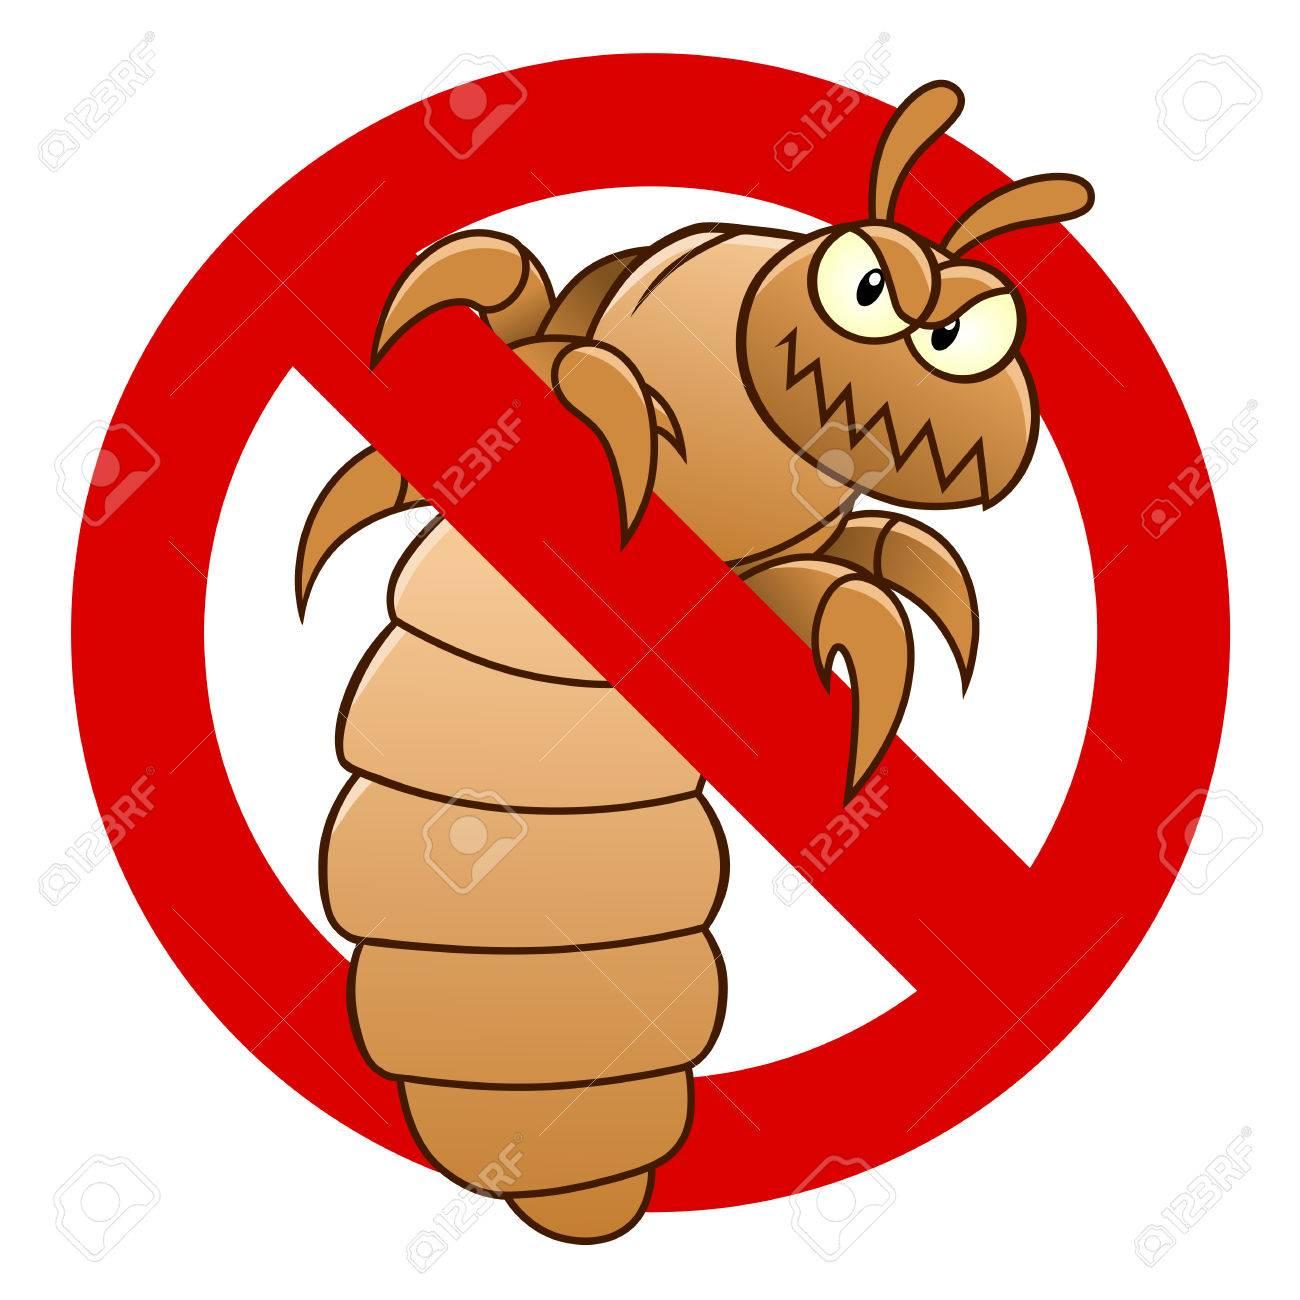 Anti louse sign - 73582329